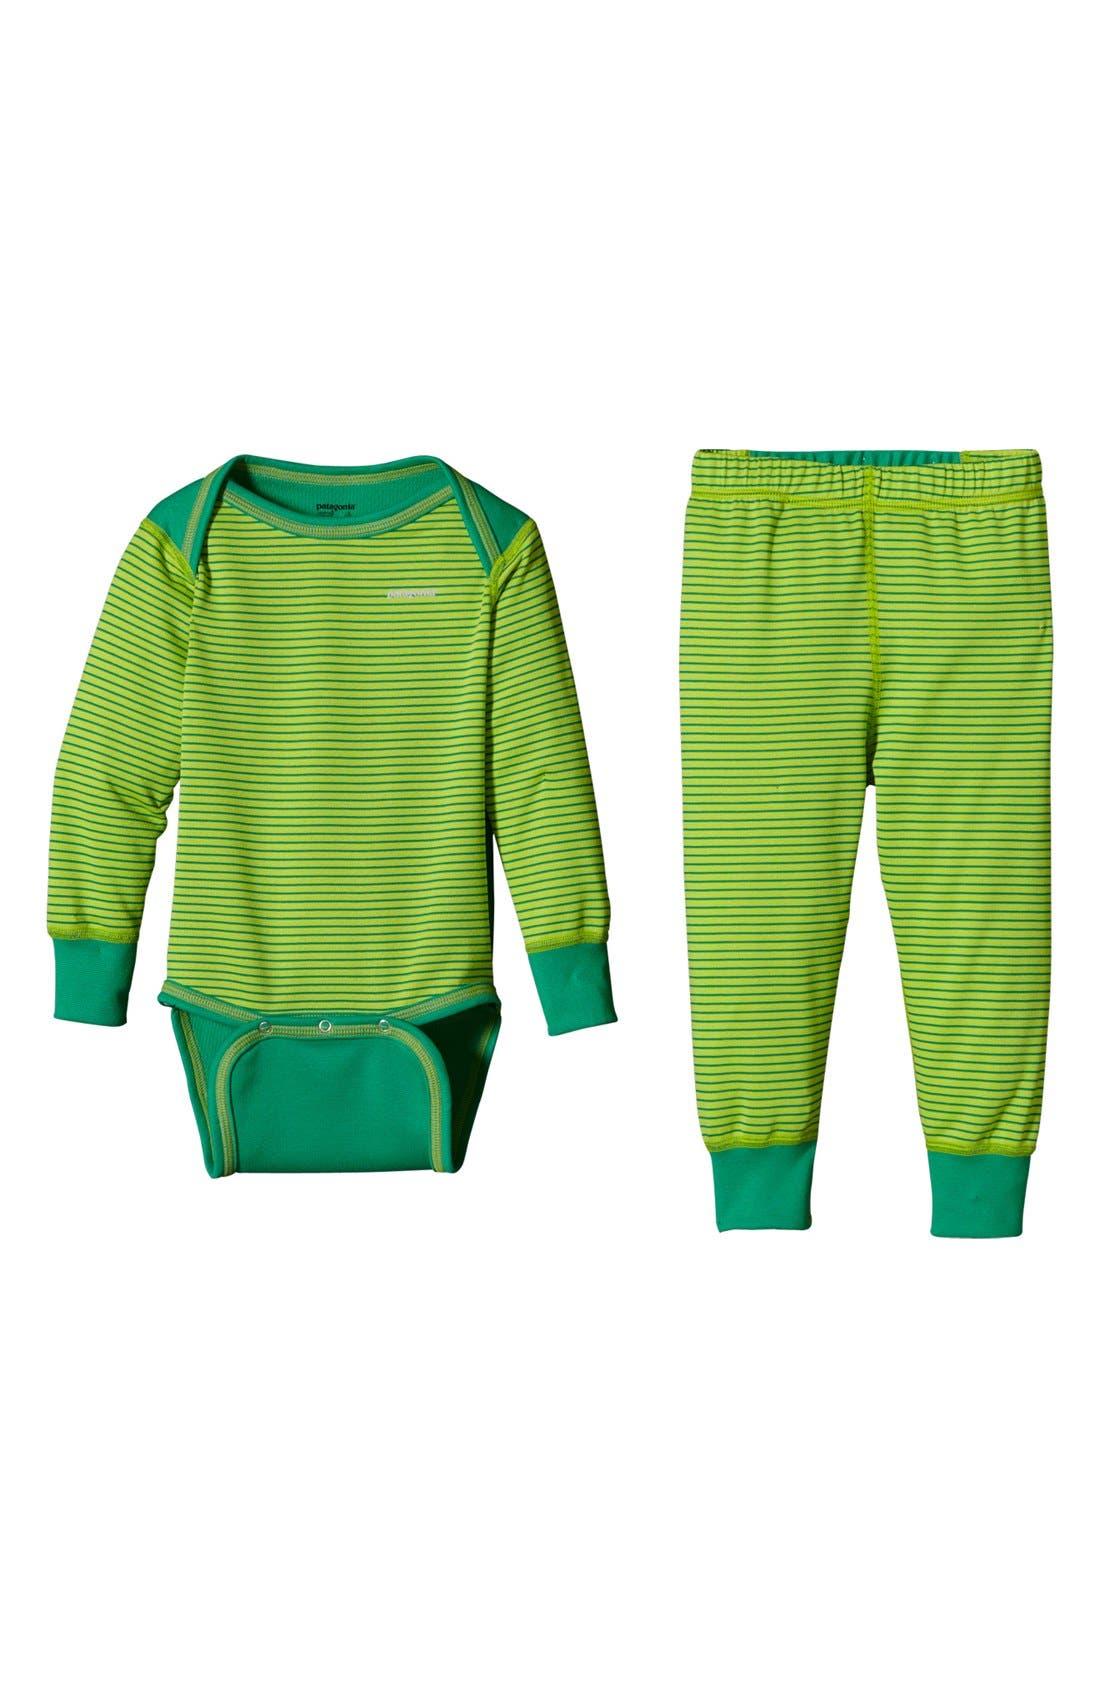 Main Image - Patagonia 'Capilene® 3' Bodysuit & Pants (Toddler)